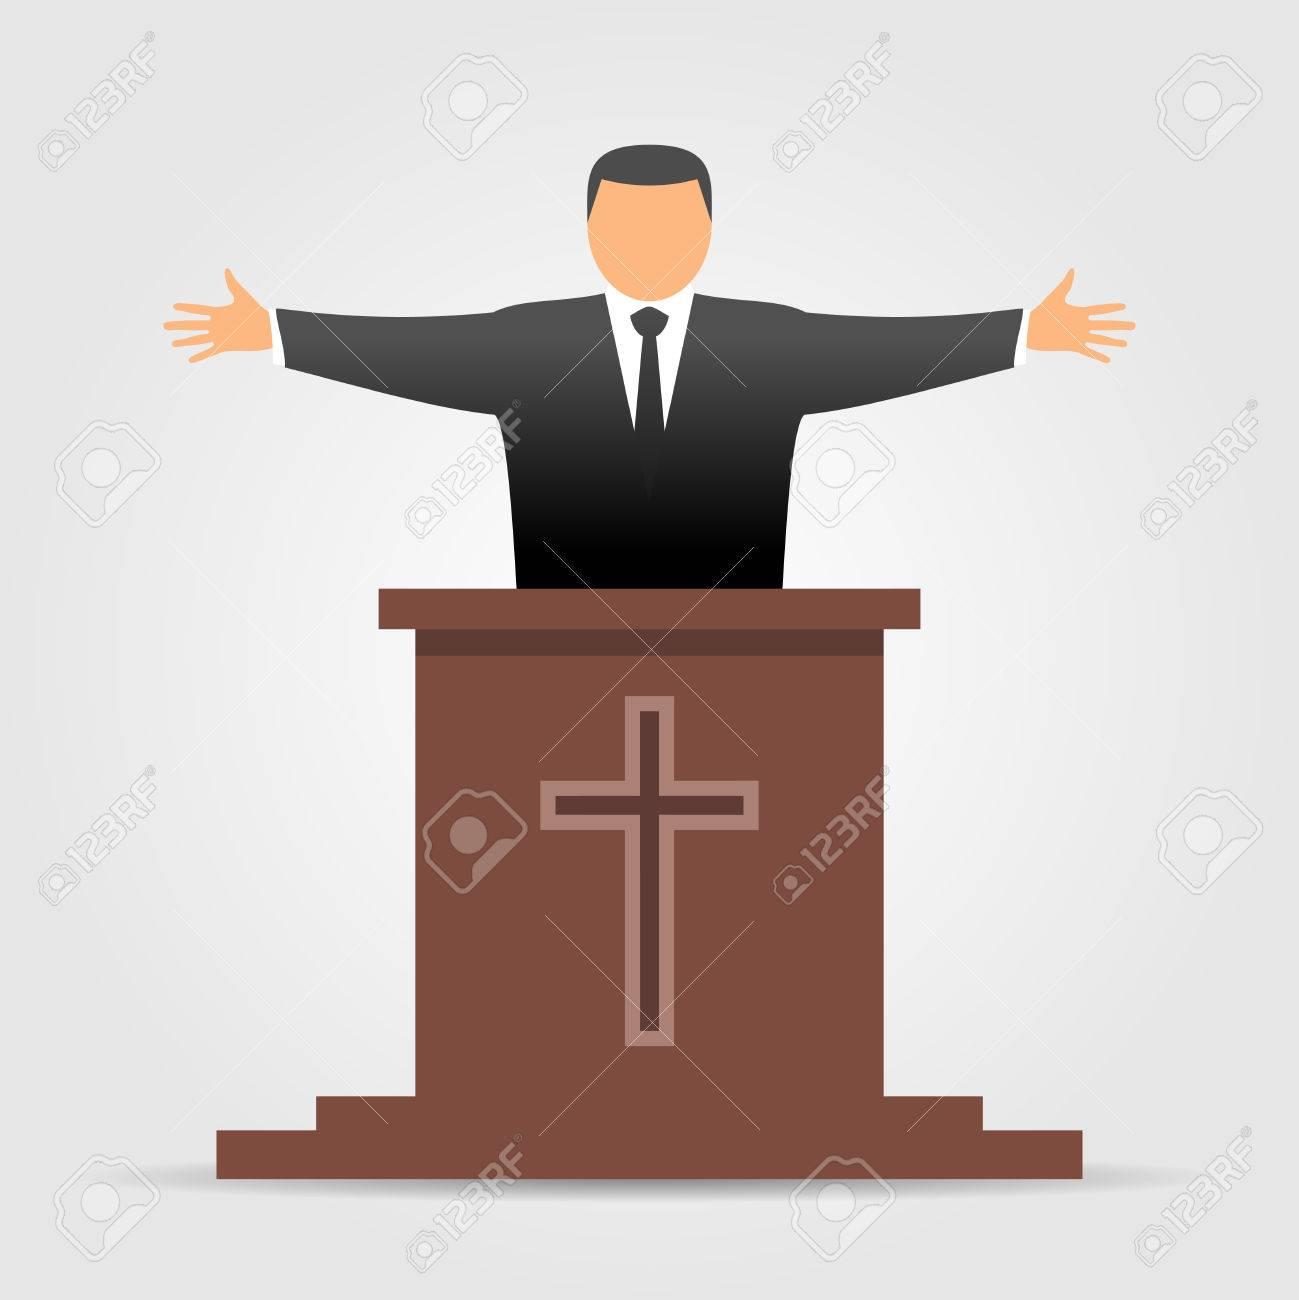 hight resolution of preacher icon stock vector 76960569